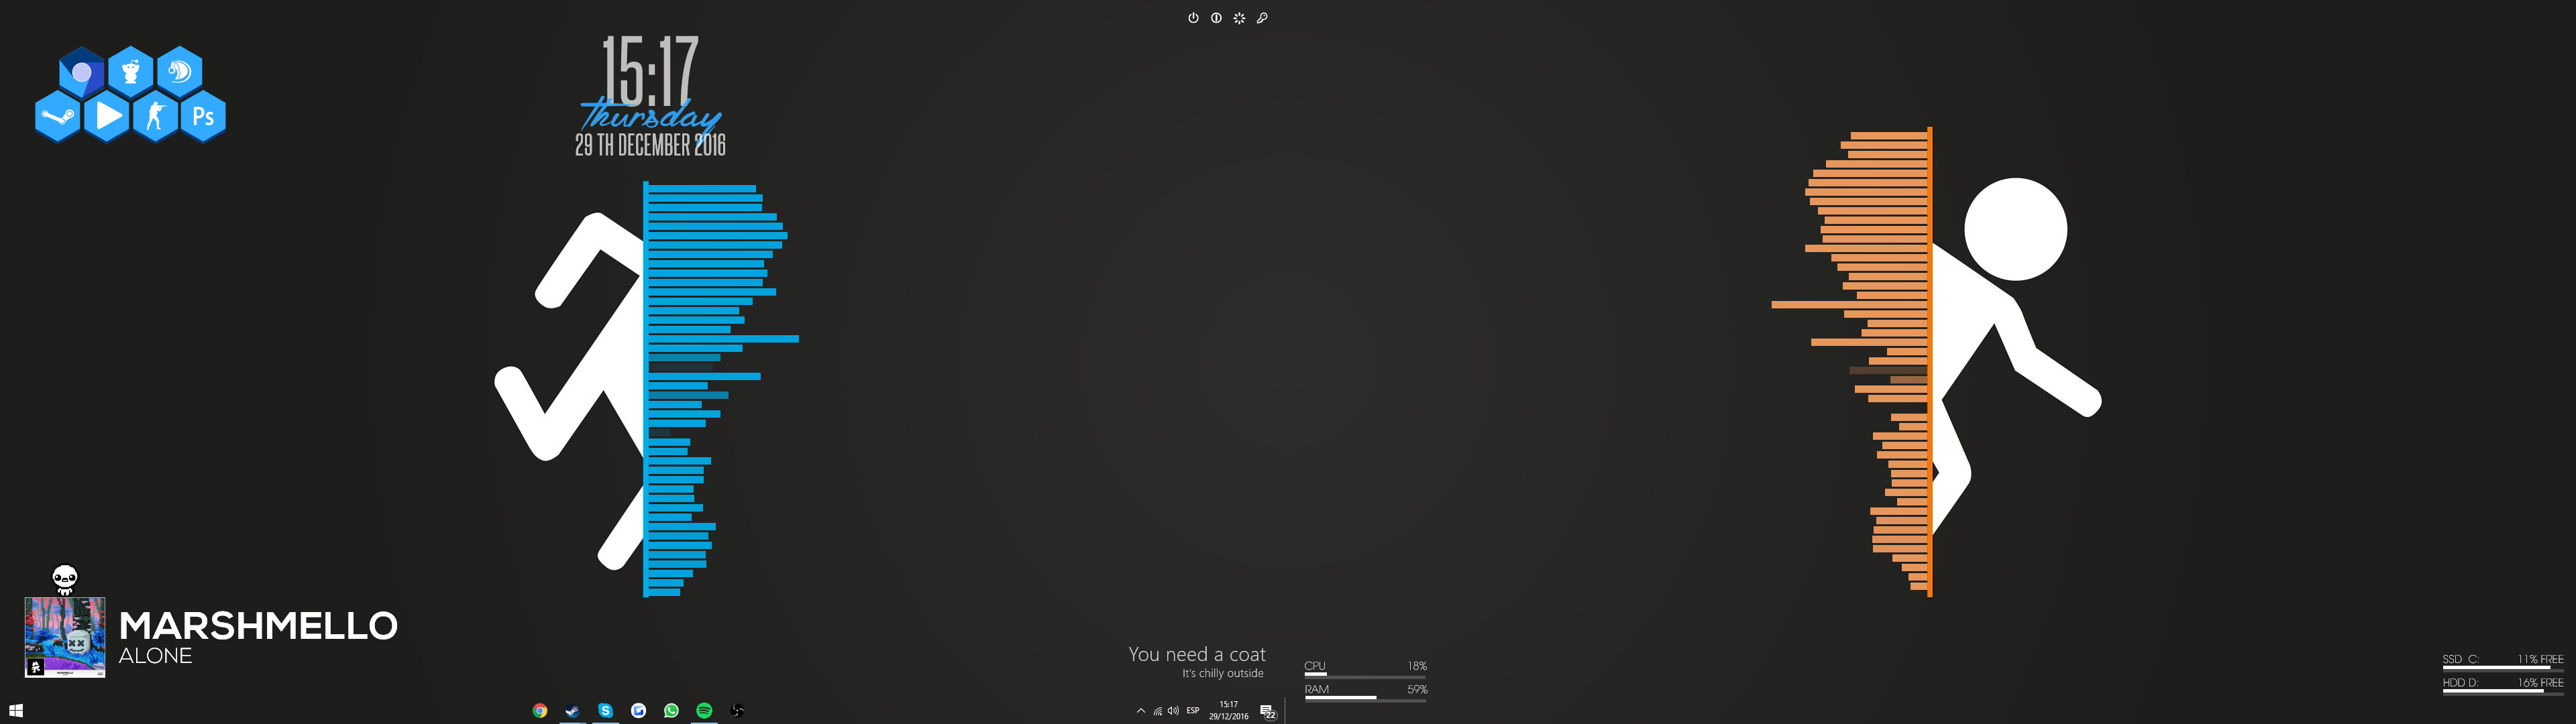 ShowcasePortal wallpaper dual monitor …